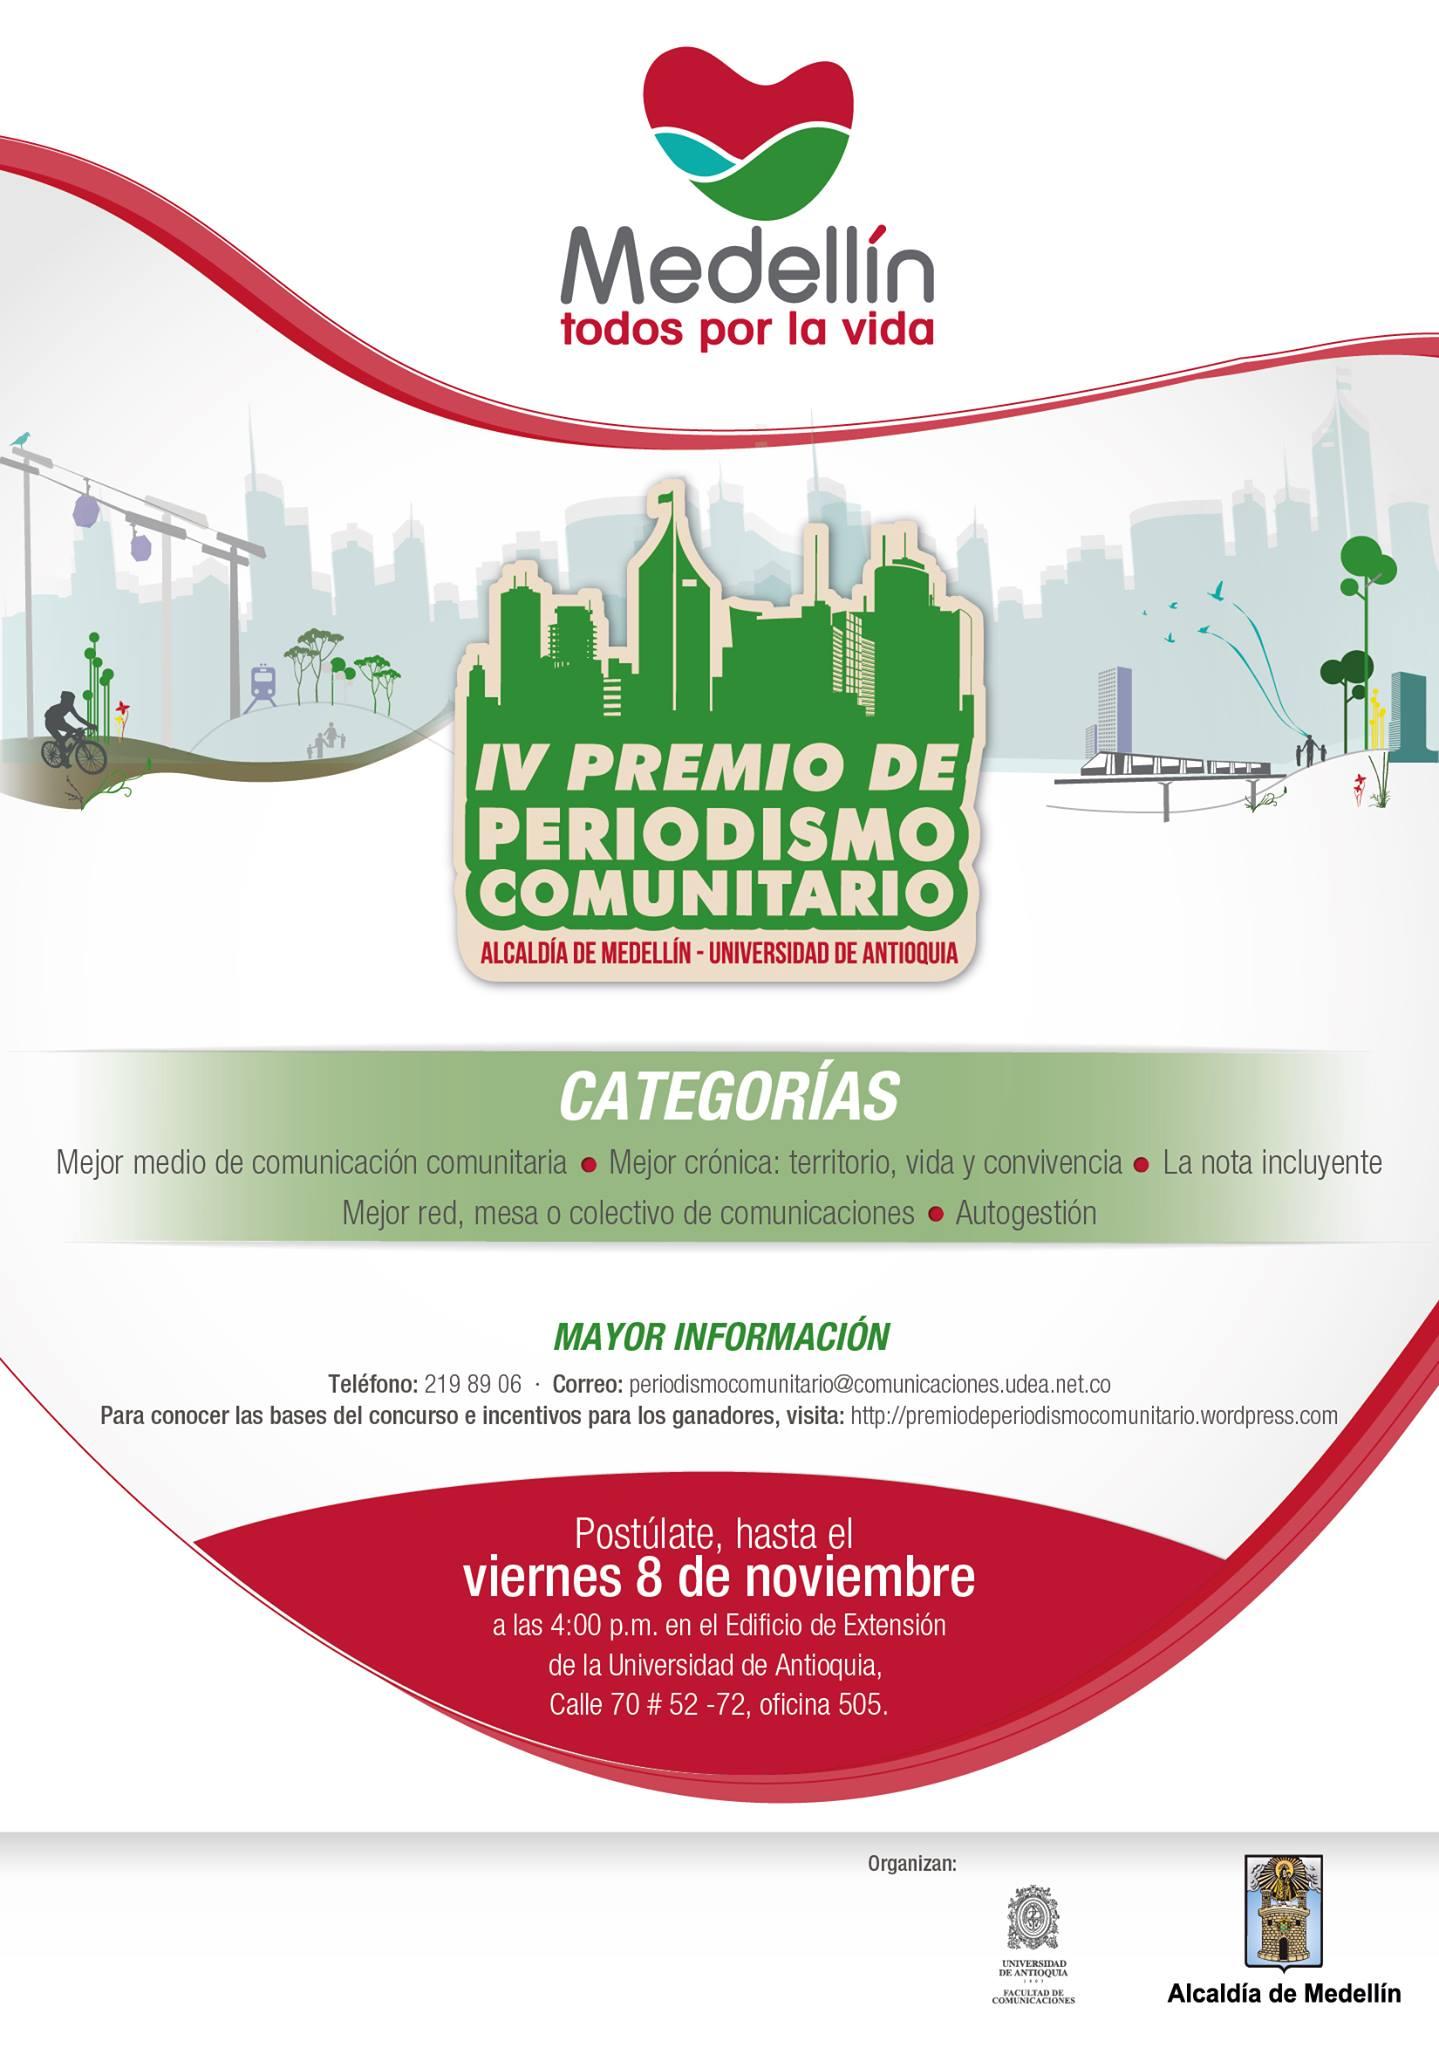 |IV Premio de Periodismo Comunitario Municipio de Medellín - Universidad de Antioquia